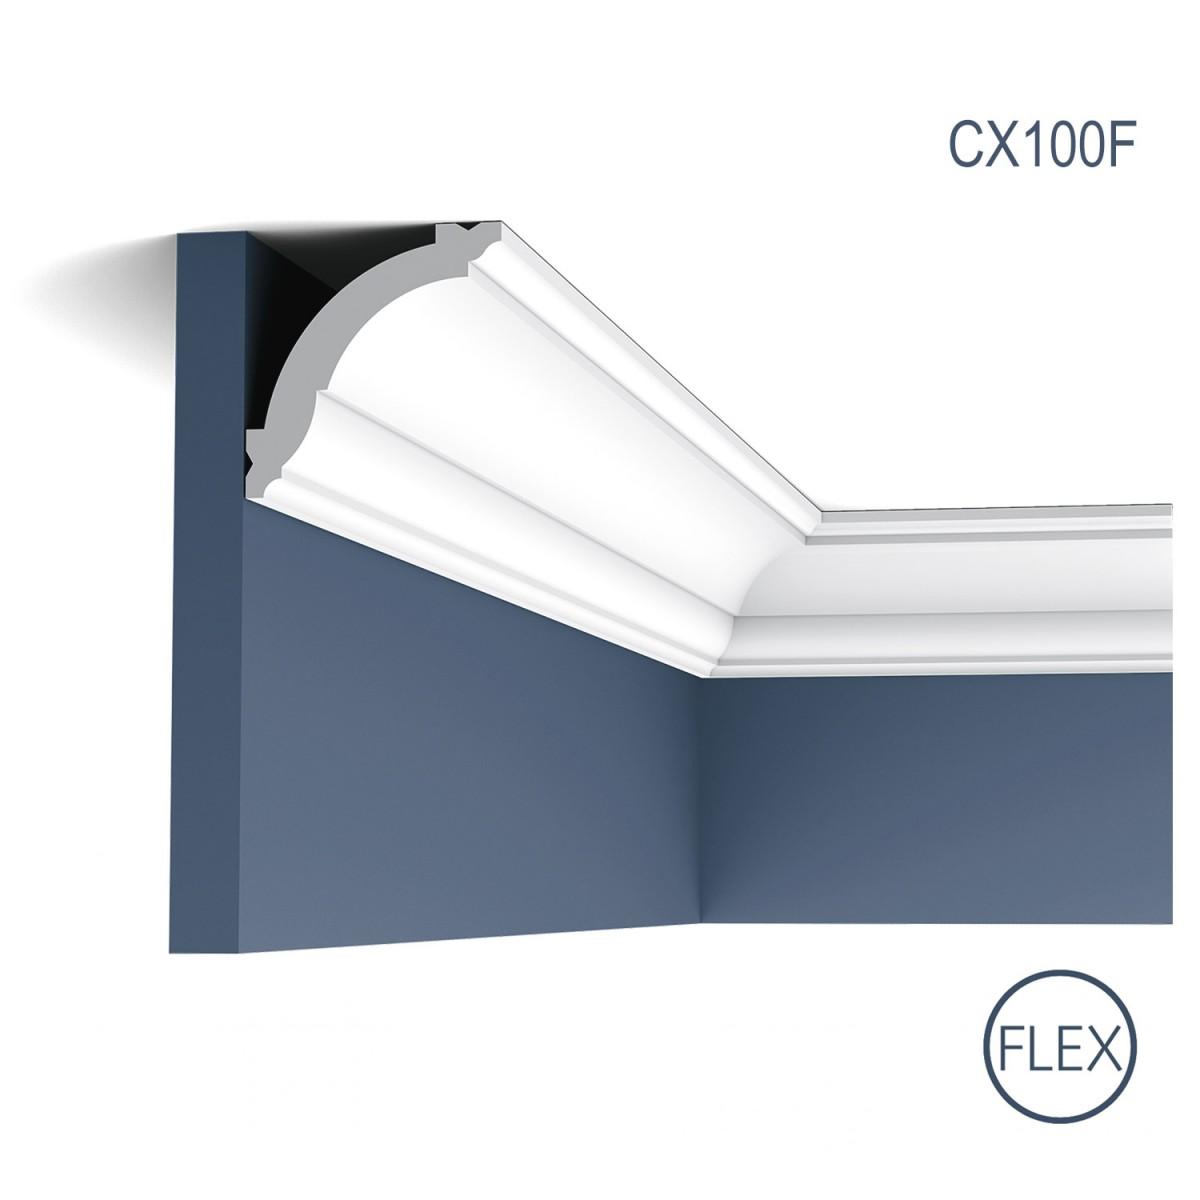 Cornisa Flex Axxent CX100F, Dimensiuni: 200 X 6.9 X 7.1 cm, Orac Decor